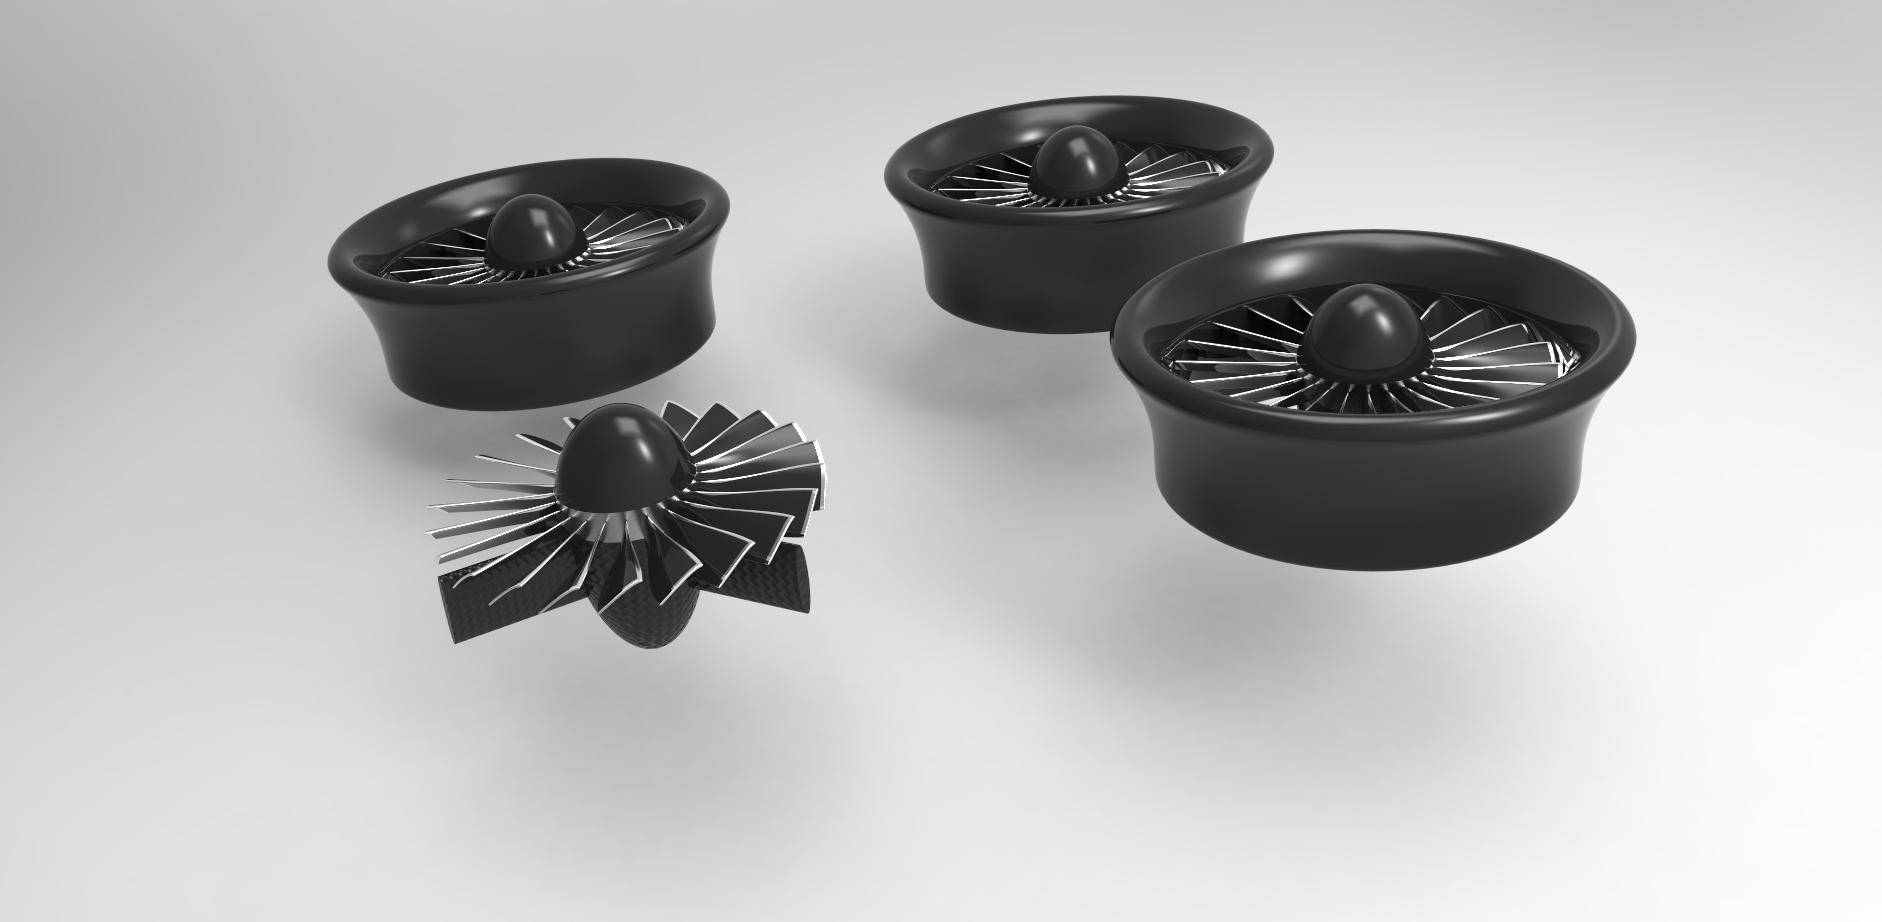 ducted fans for vtol uas quadcopter autodesk online gallery. Black Bedroom Furniture Sets. Home Design Ideas